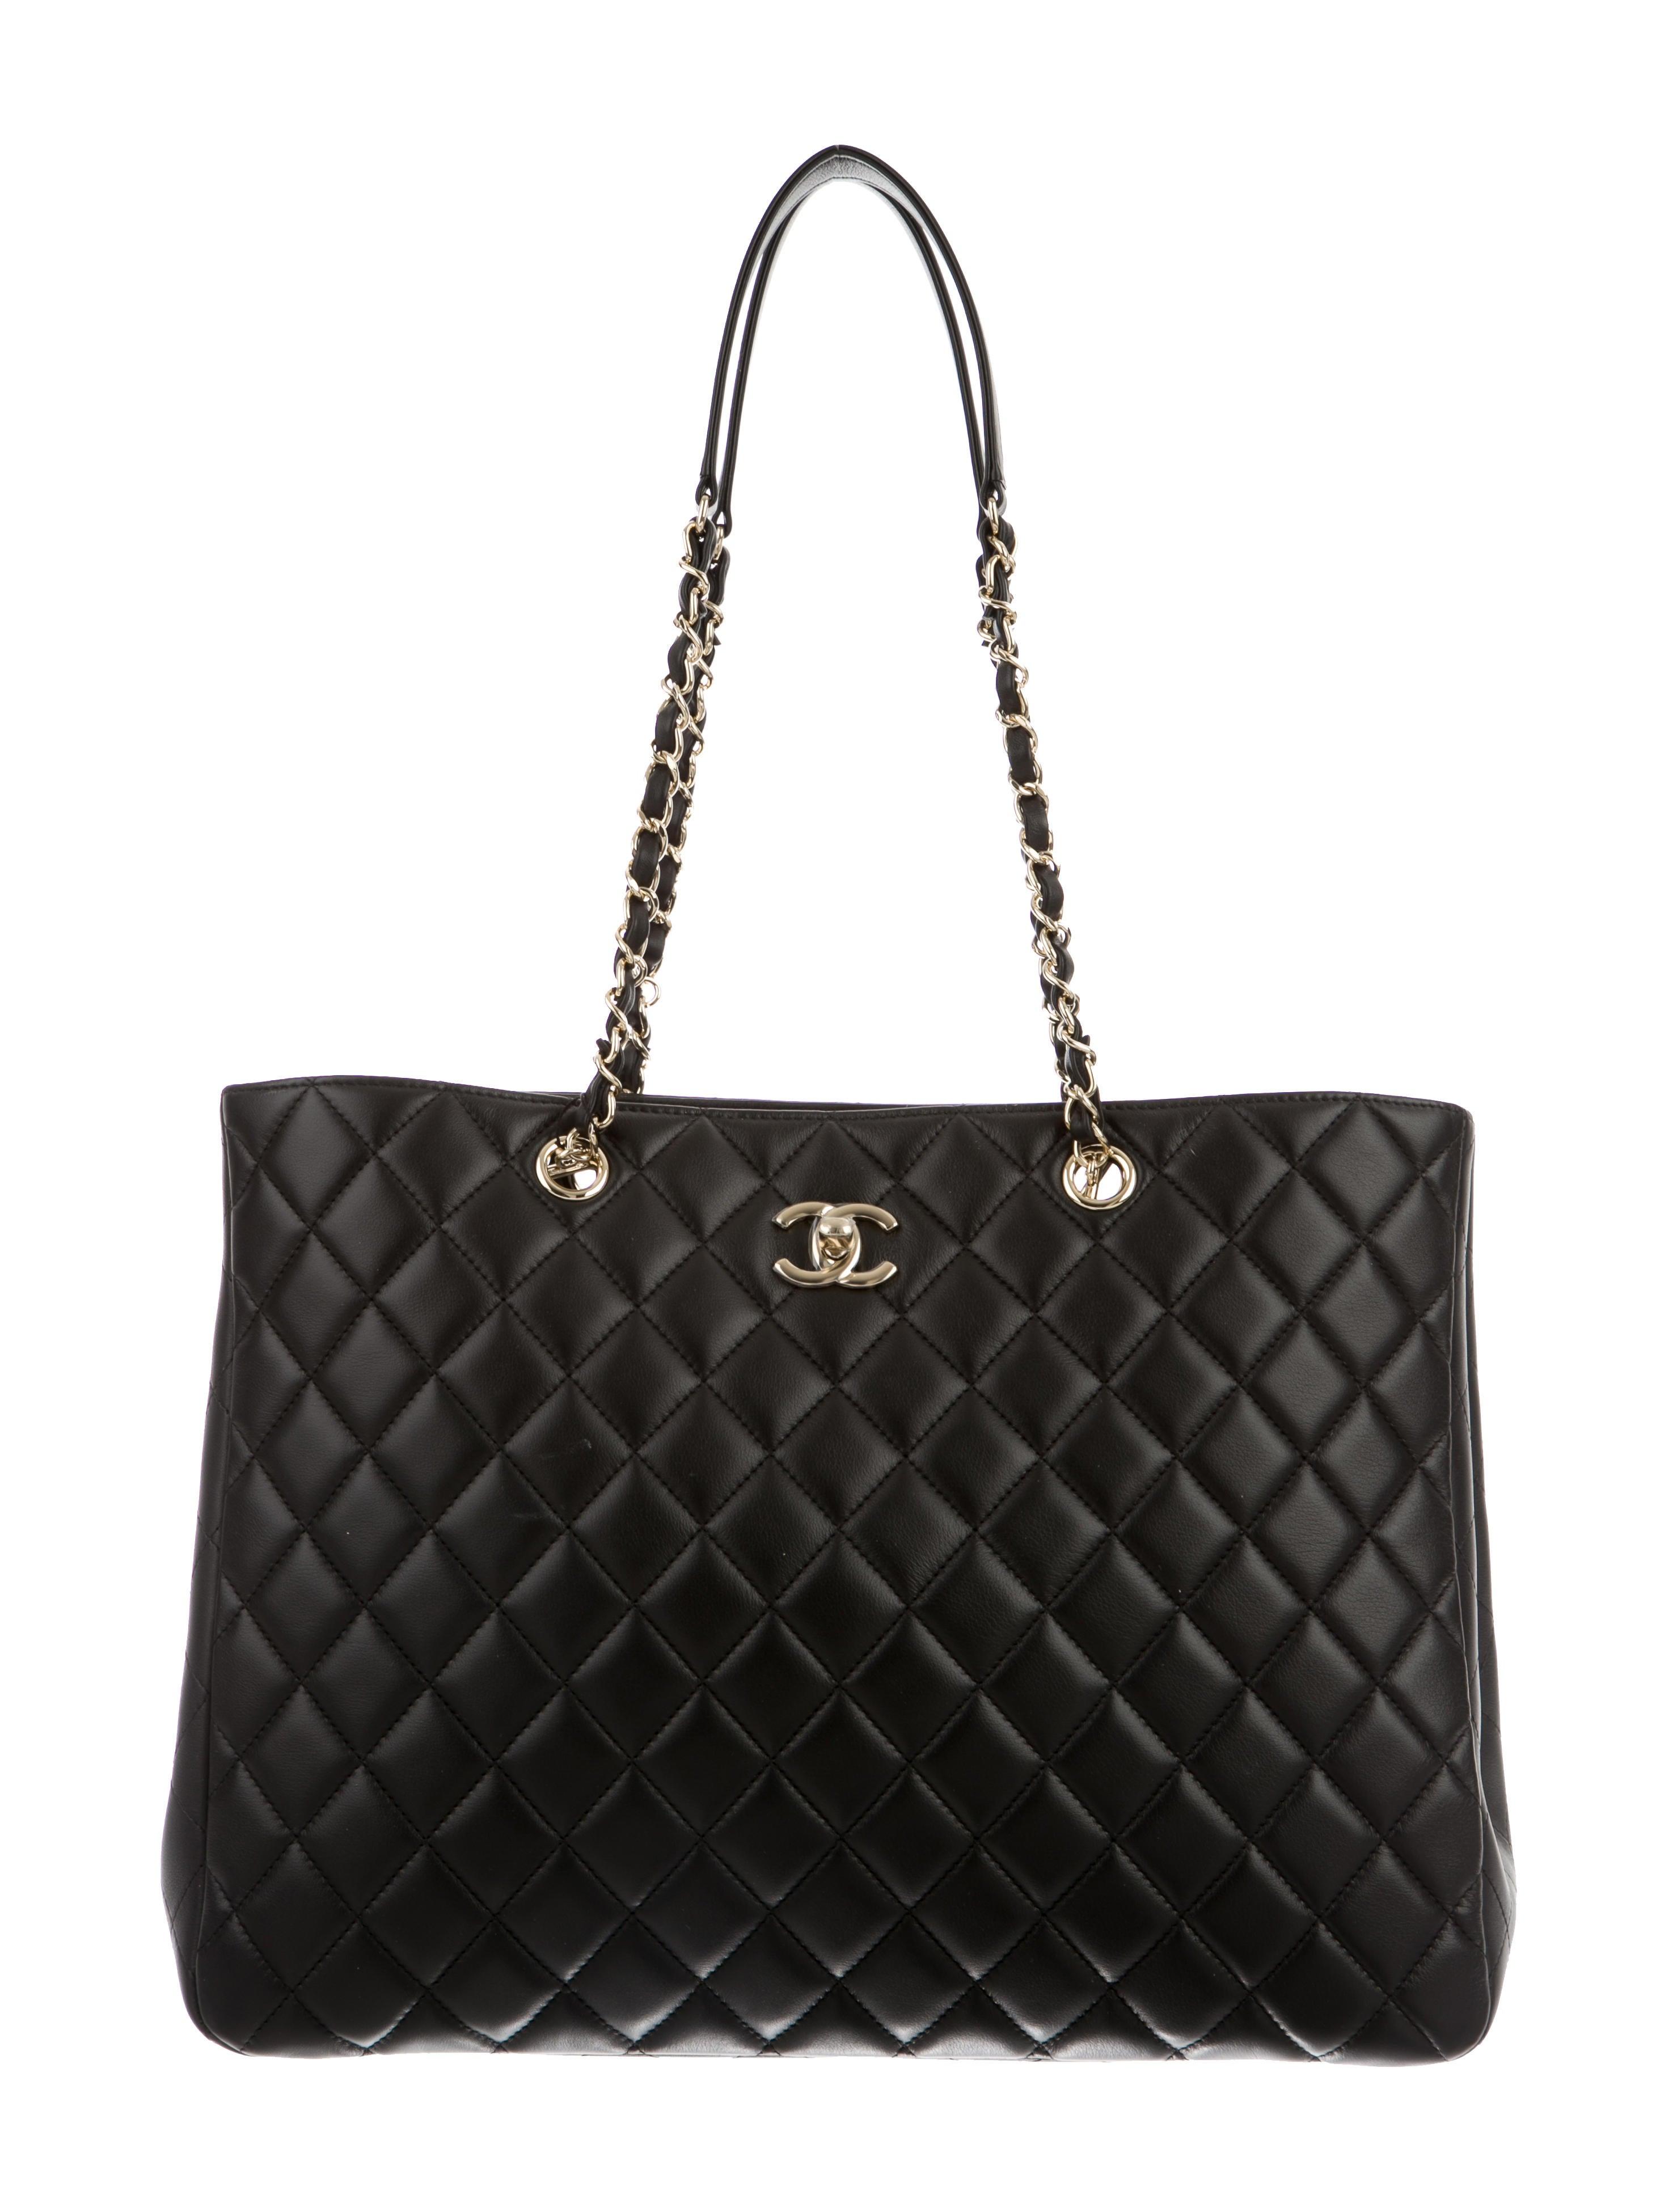 0627c03e9386 Chanel 2016 Timeless Classic Tote - Handbags - CHA138857